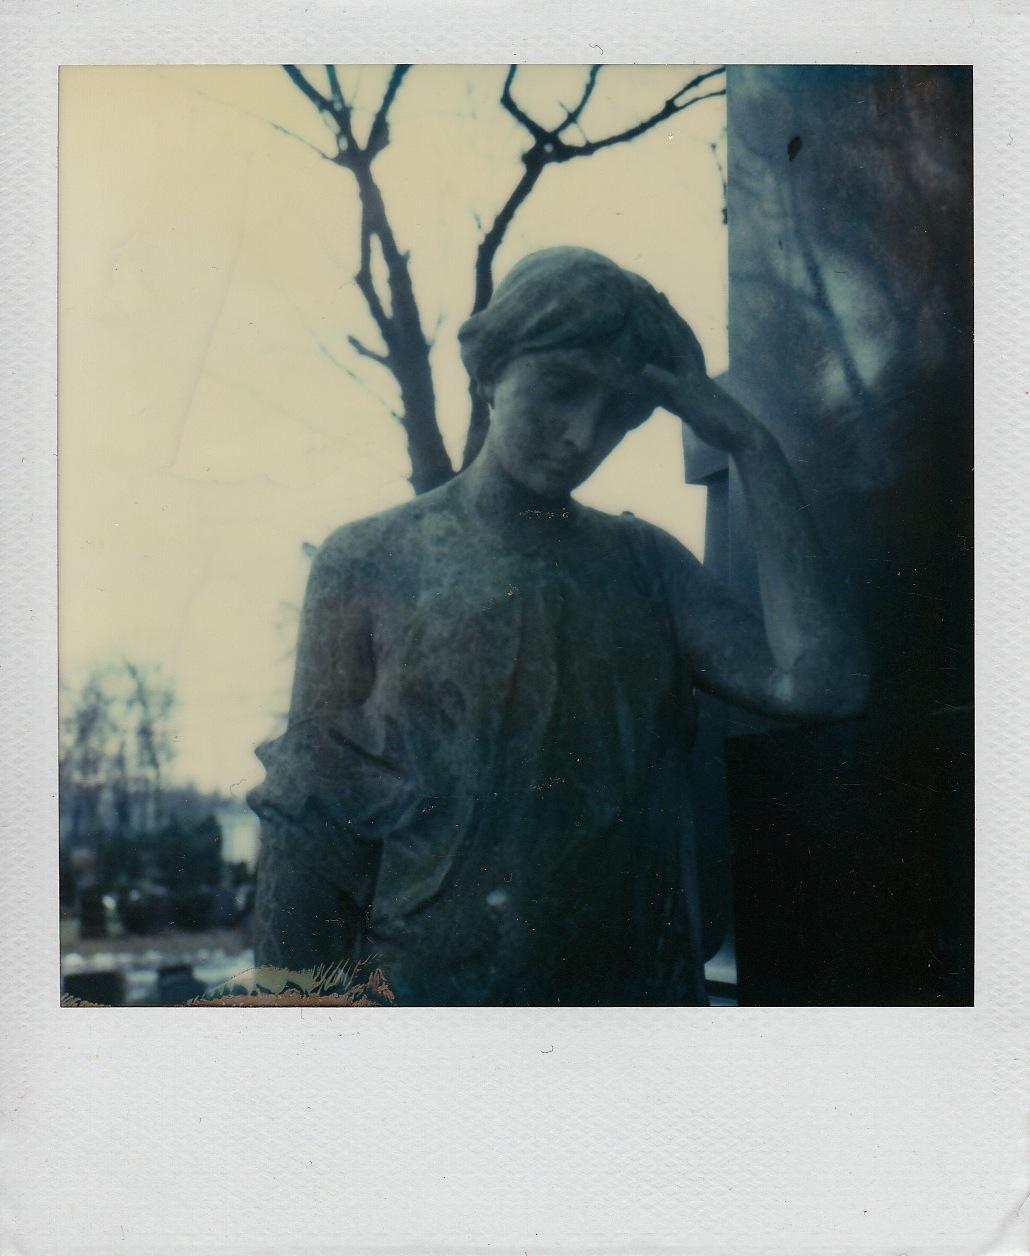 Polaroid 73, Norbert W. Schlinkert